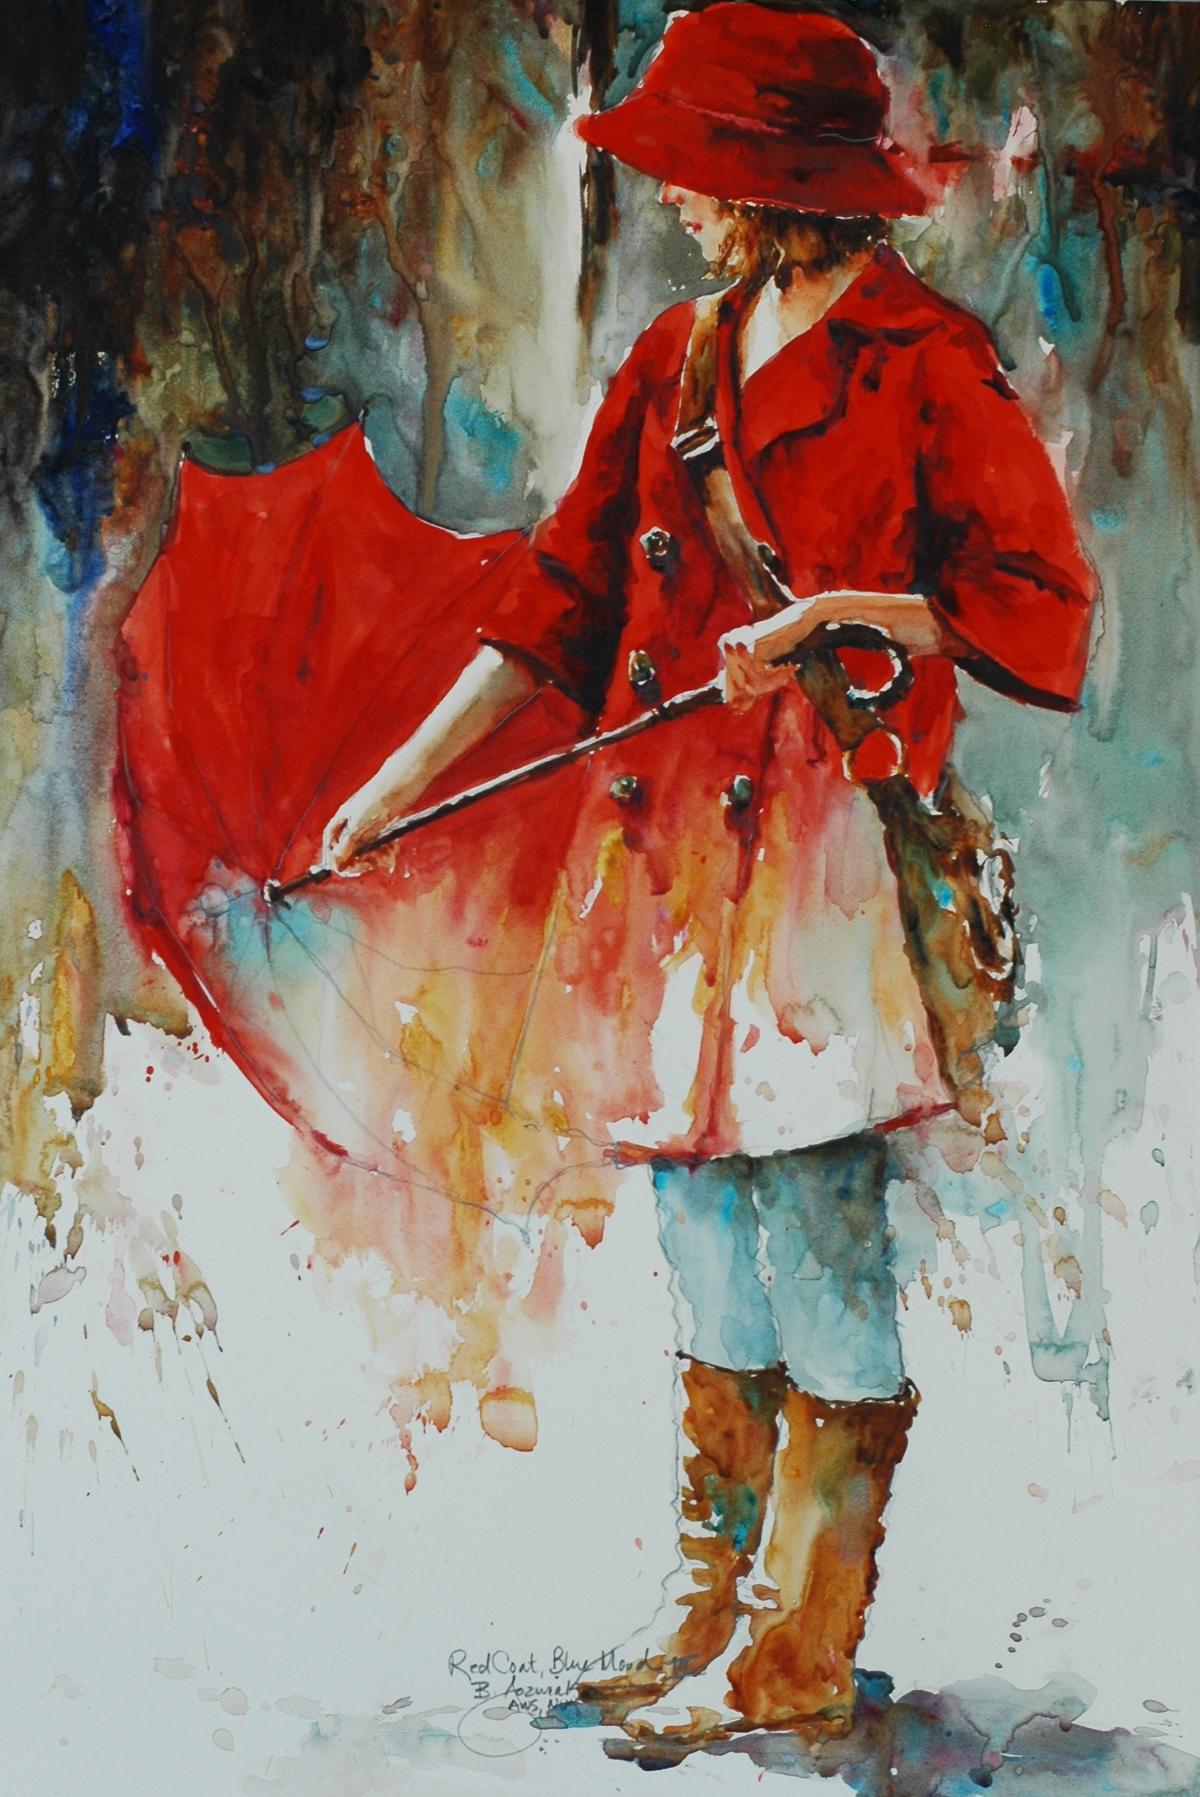 s,_Red Coat, Blue Mood III_22x15.jpg